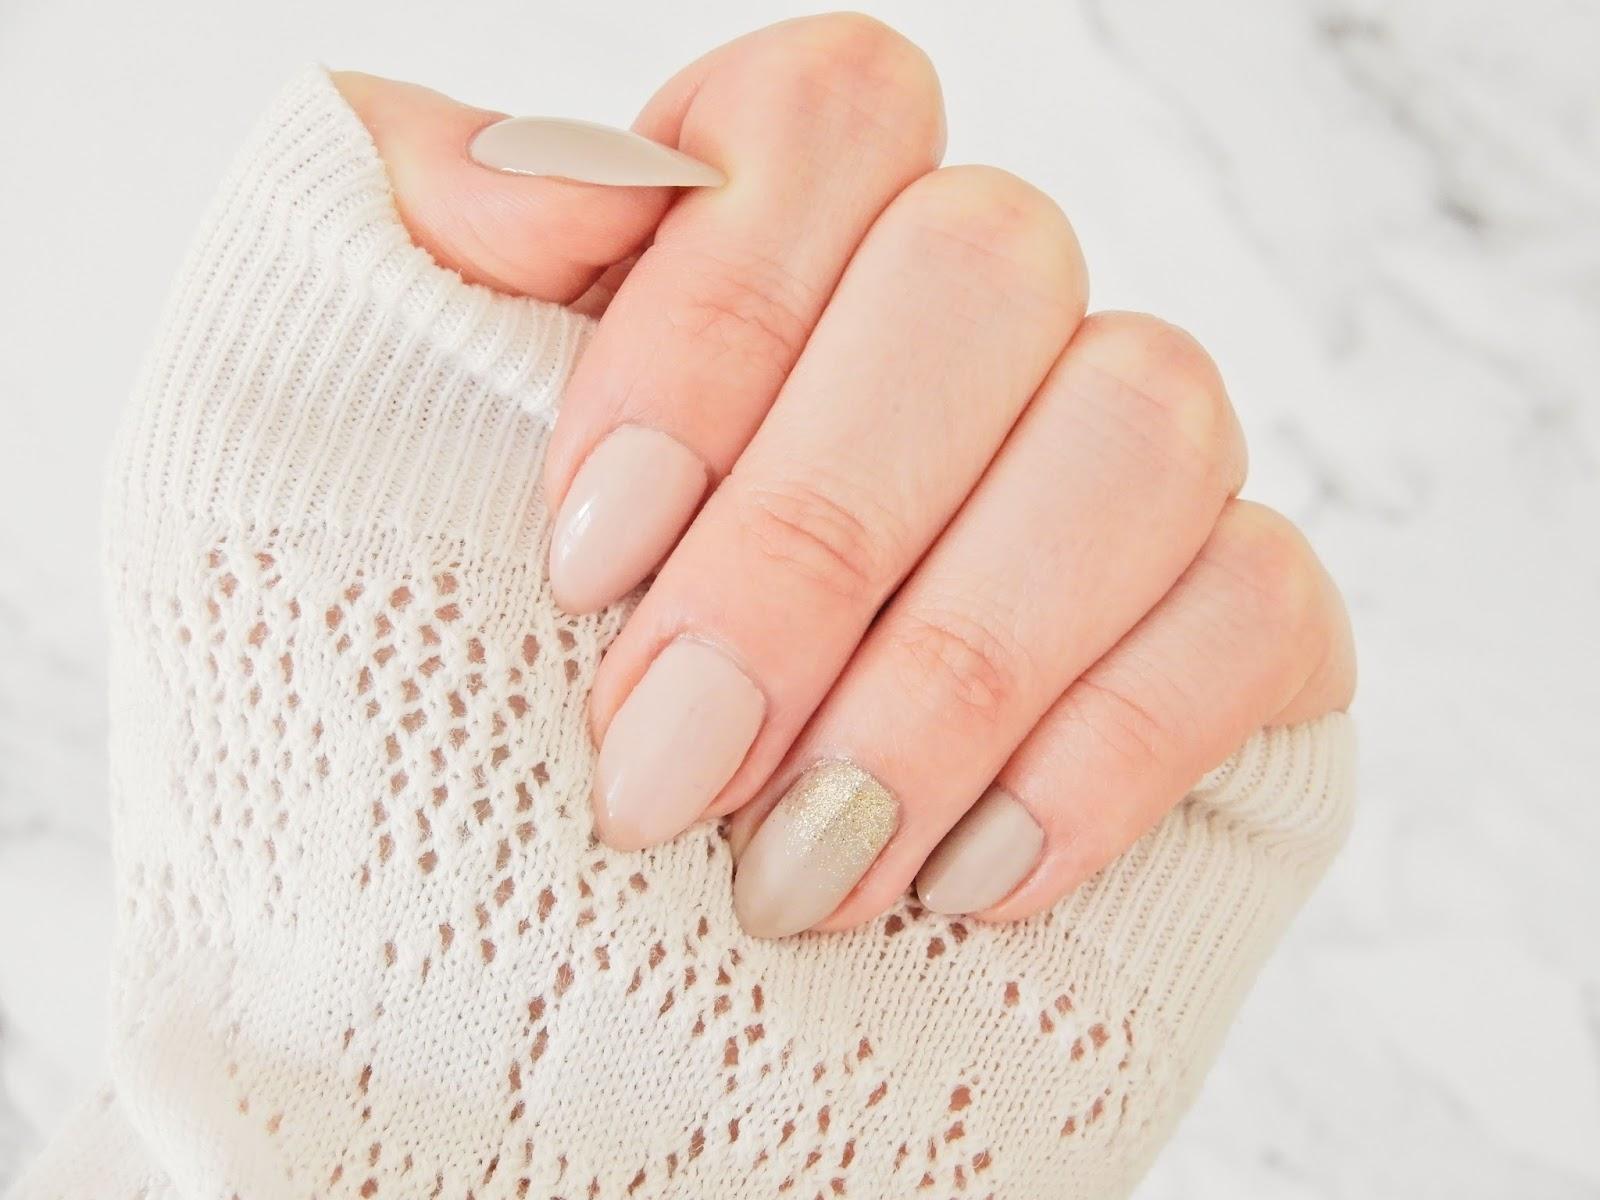 Gold Disco semilac, Frappe z Semilac, Silky Nude NeoNail,  manicure hybrydowy, nude manicure, klasyczny manicure, manicure hybrydowy, hybrydy,